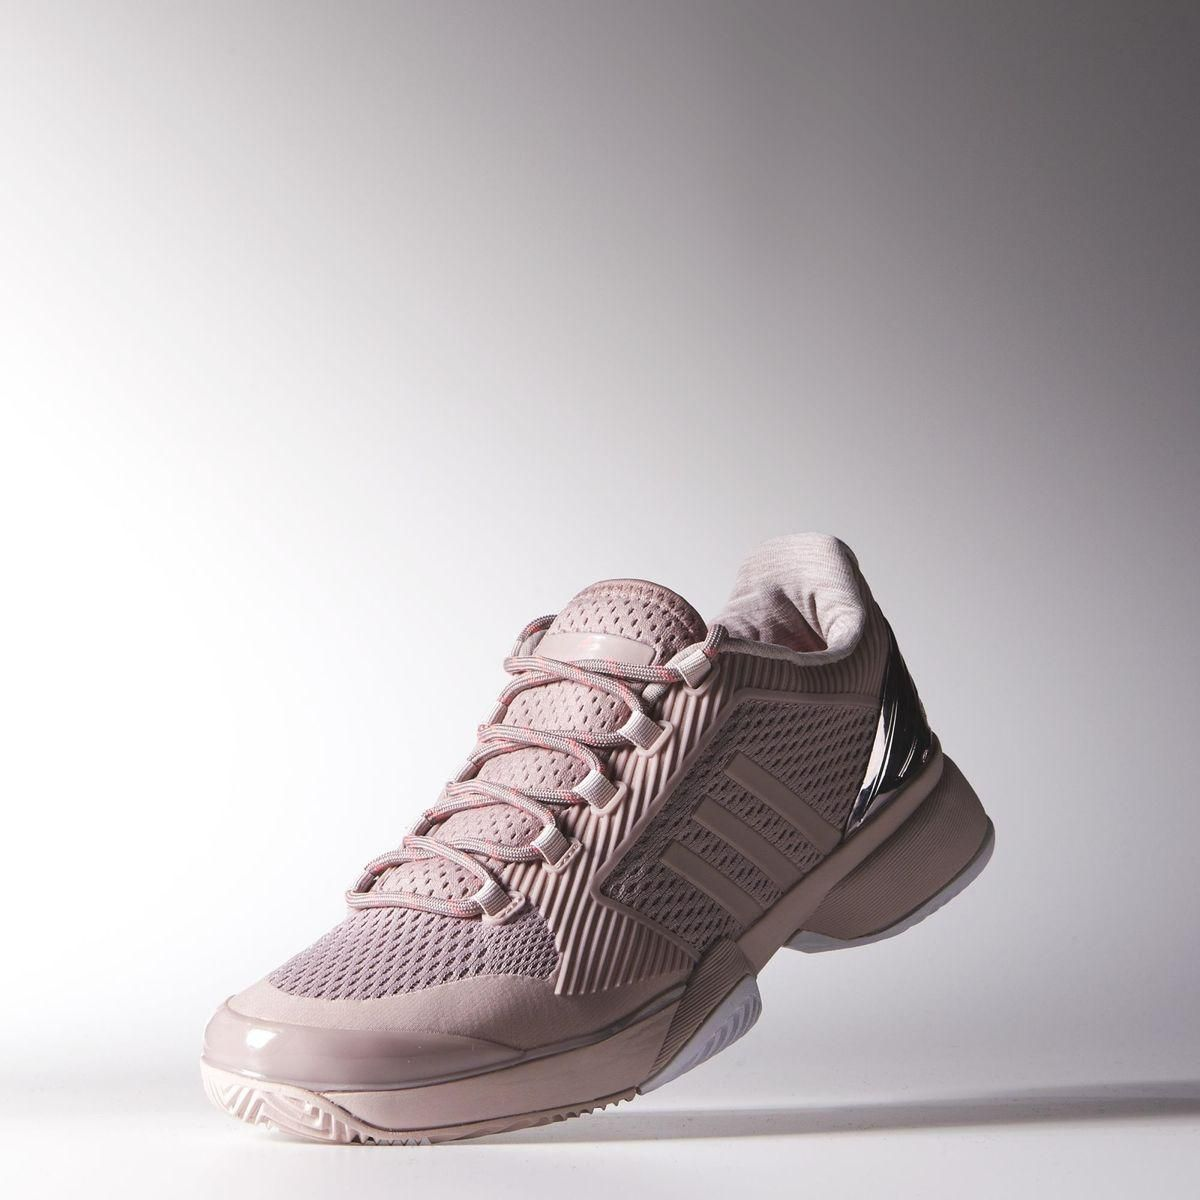 Adidas Womens Stella McCartney Barricade 2015 Tennis Shoes